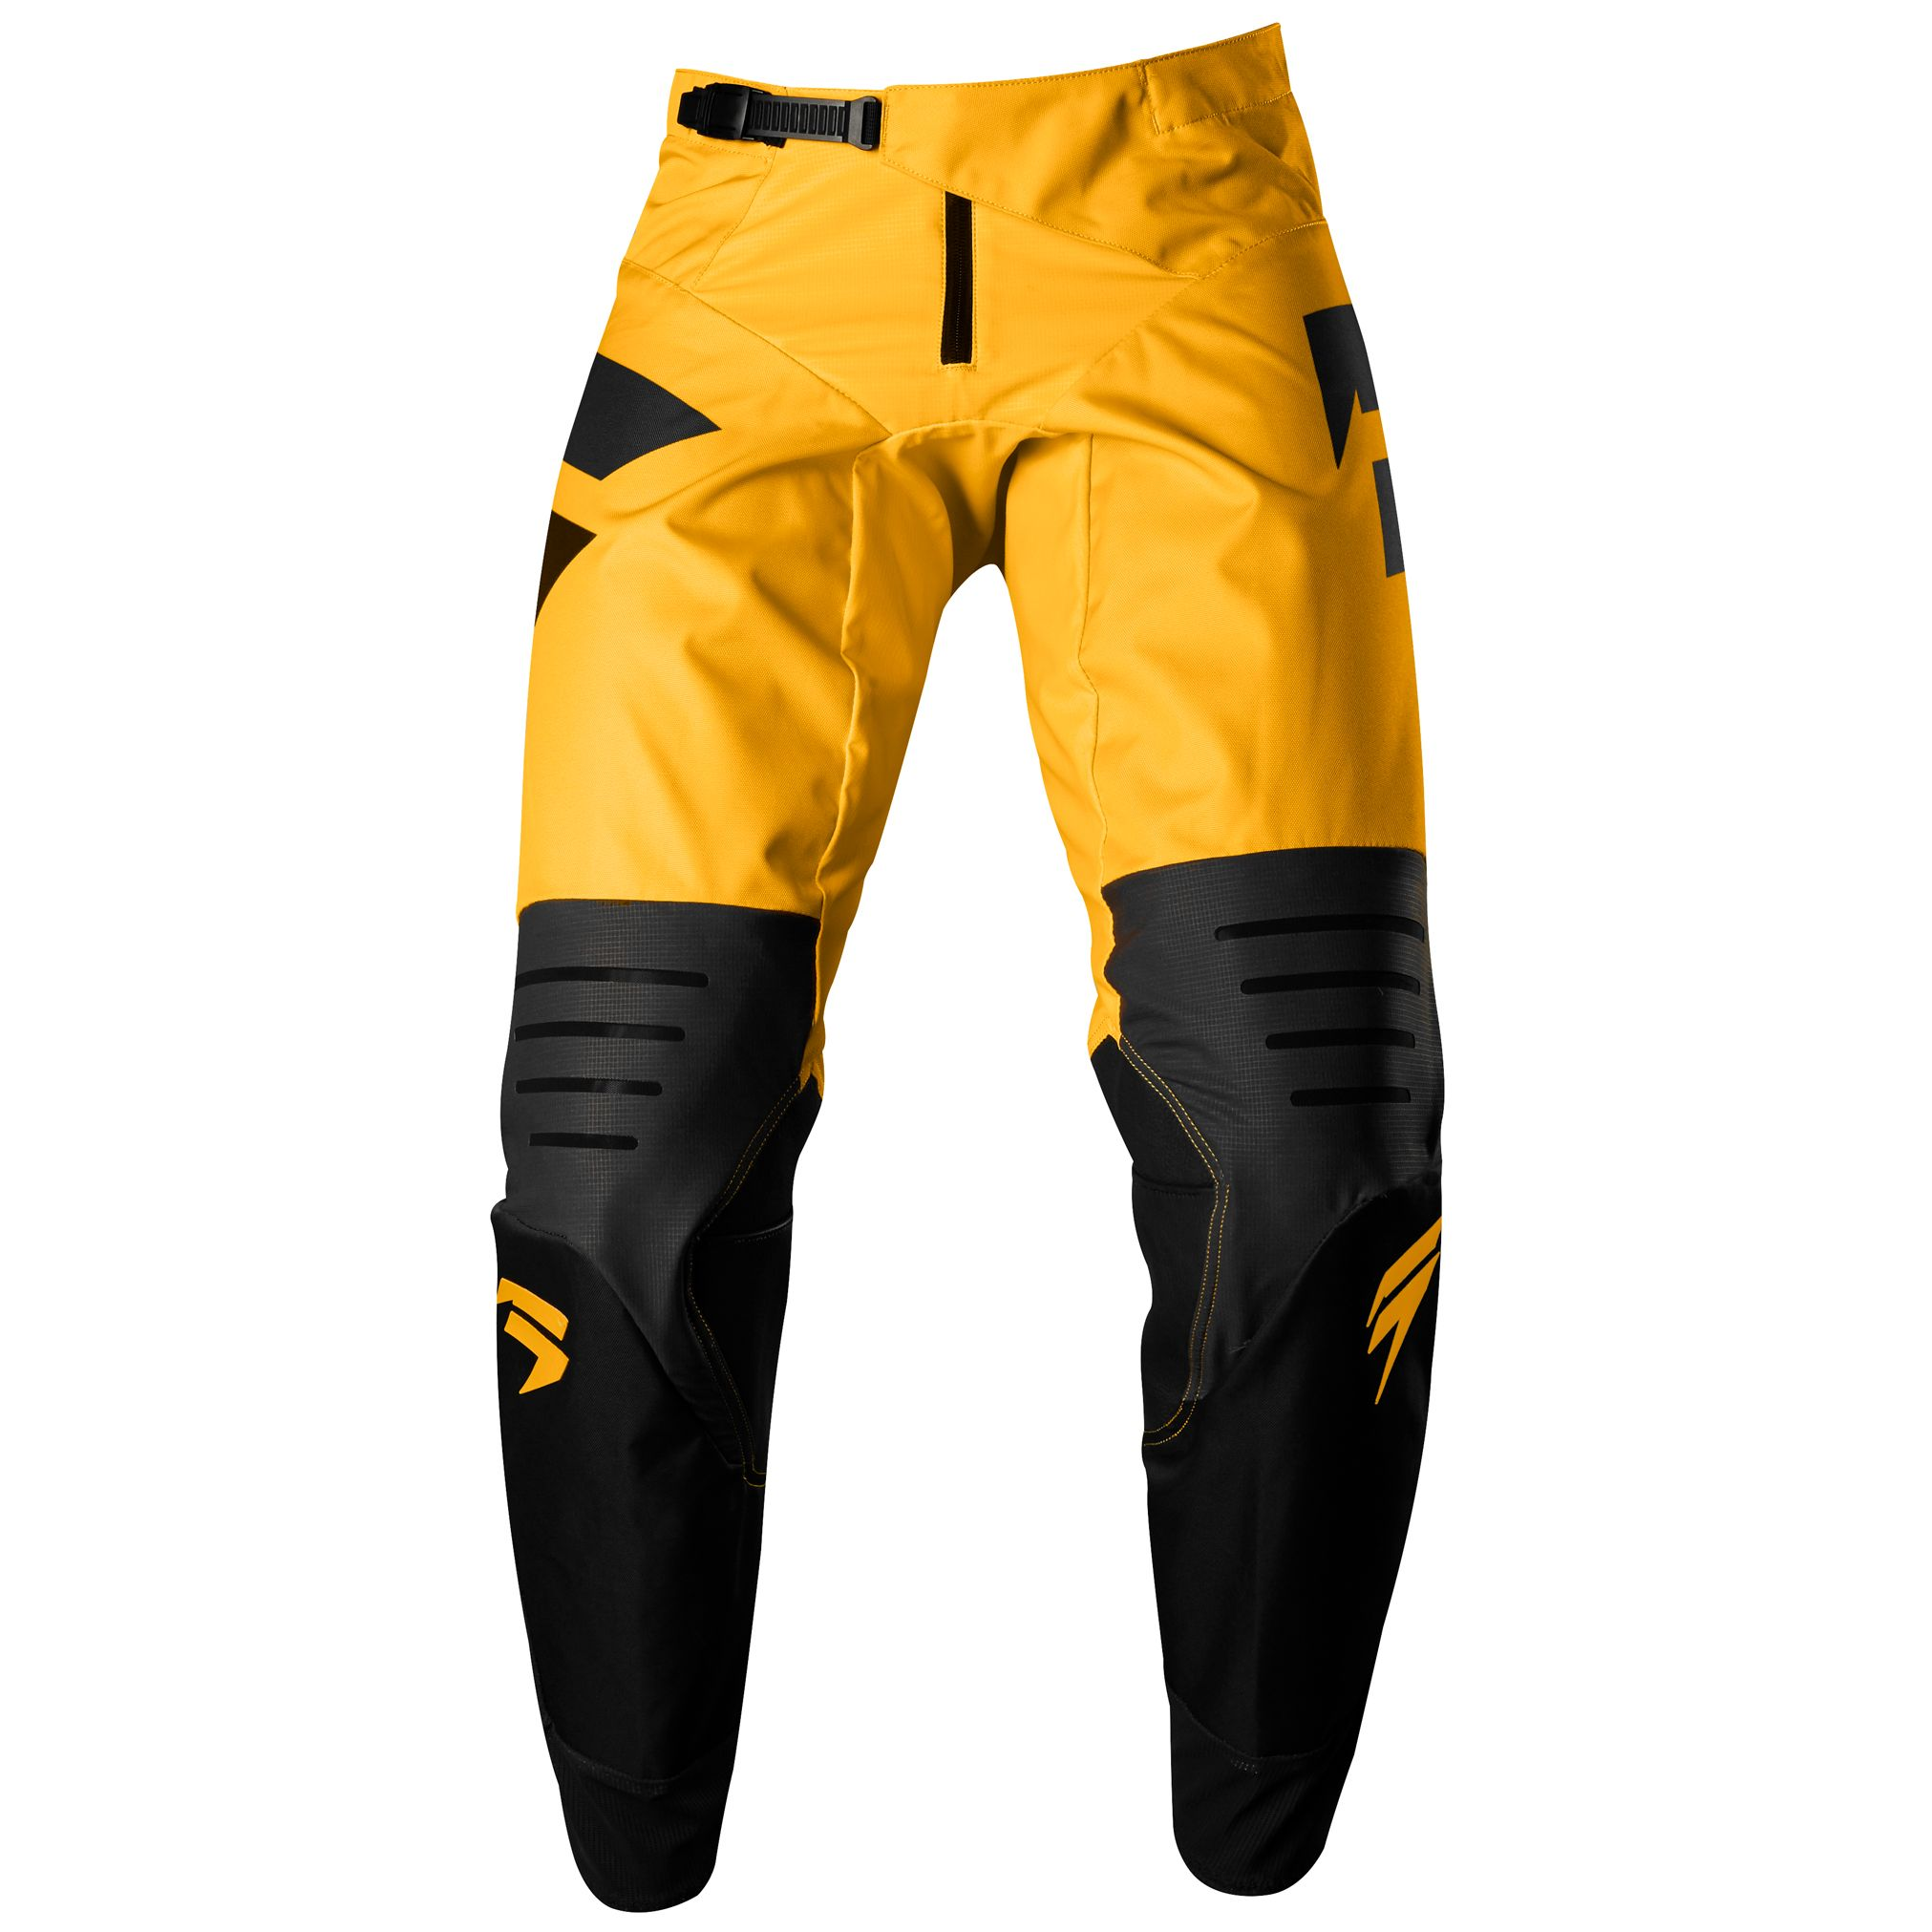 pantalon cross shift black strike jaune 2018 tenue cross. Black Bedroom Furniture Sets. Home Design Ideas